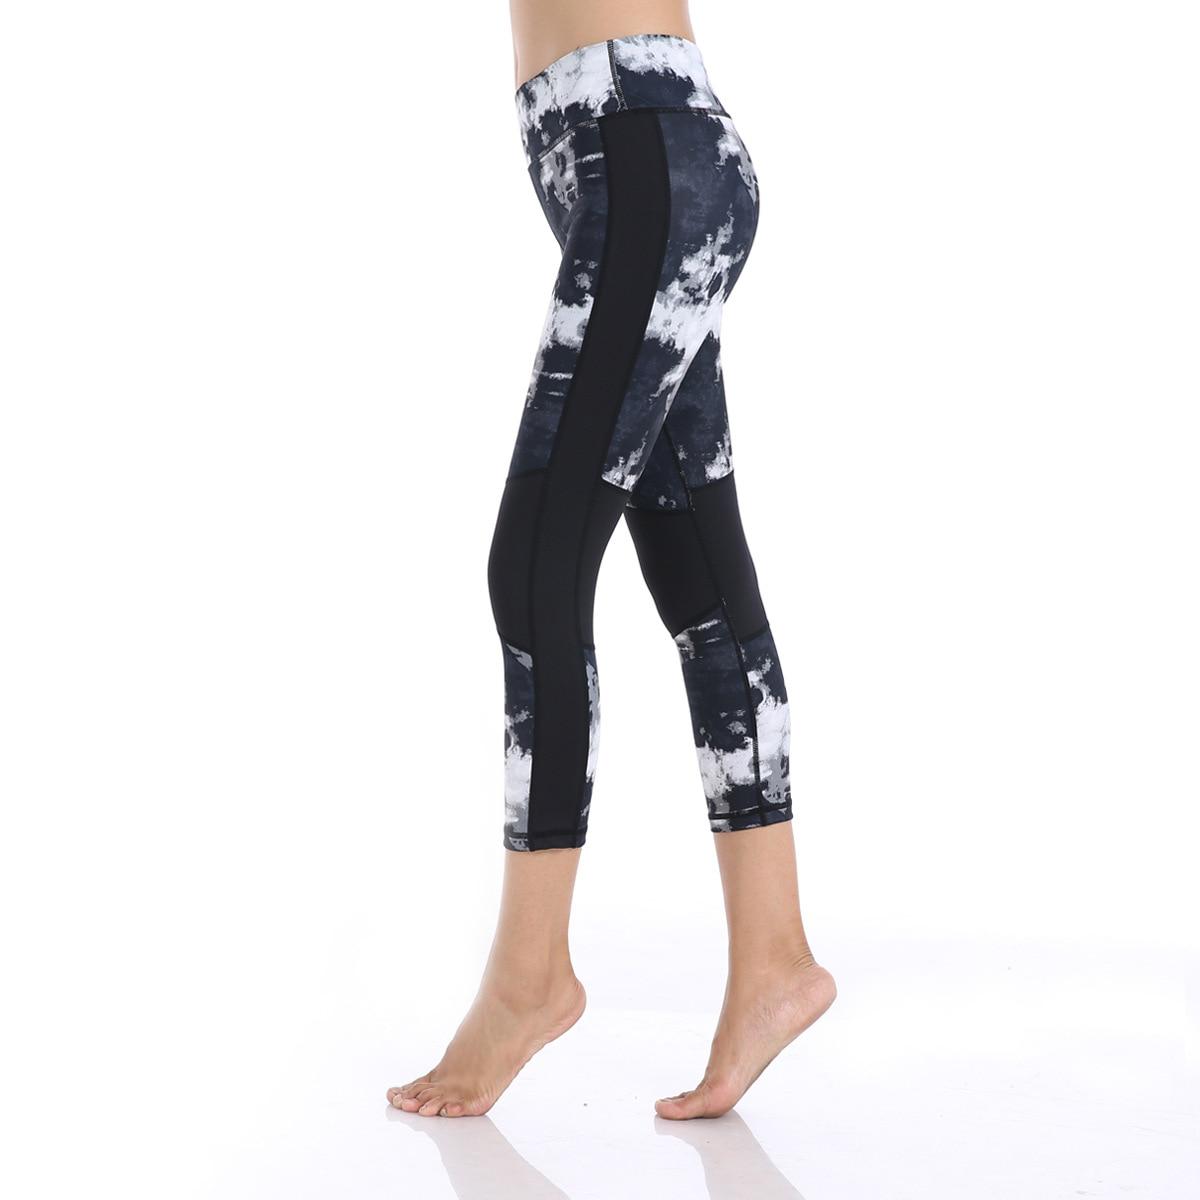 Yoga Compression Pants Sports Gym Tights Sportswear Leggings Sports Fitness Slim Mesh Yoga Pants Leggings For Women